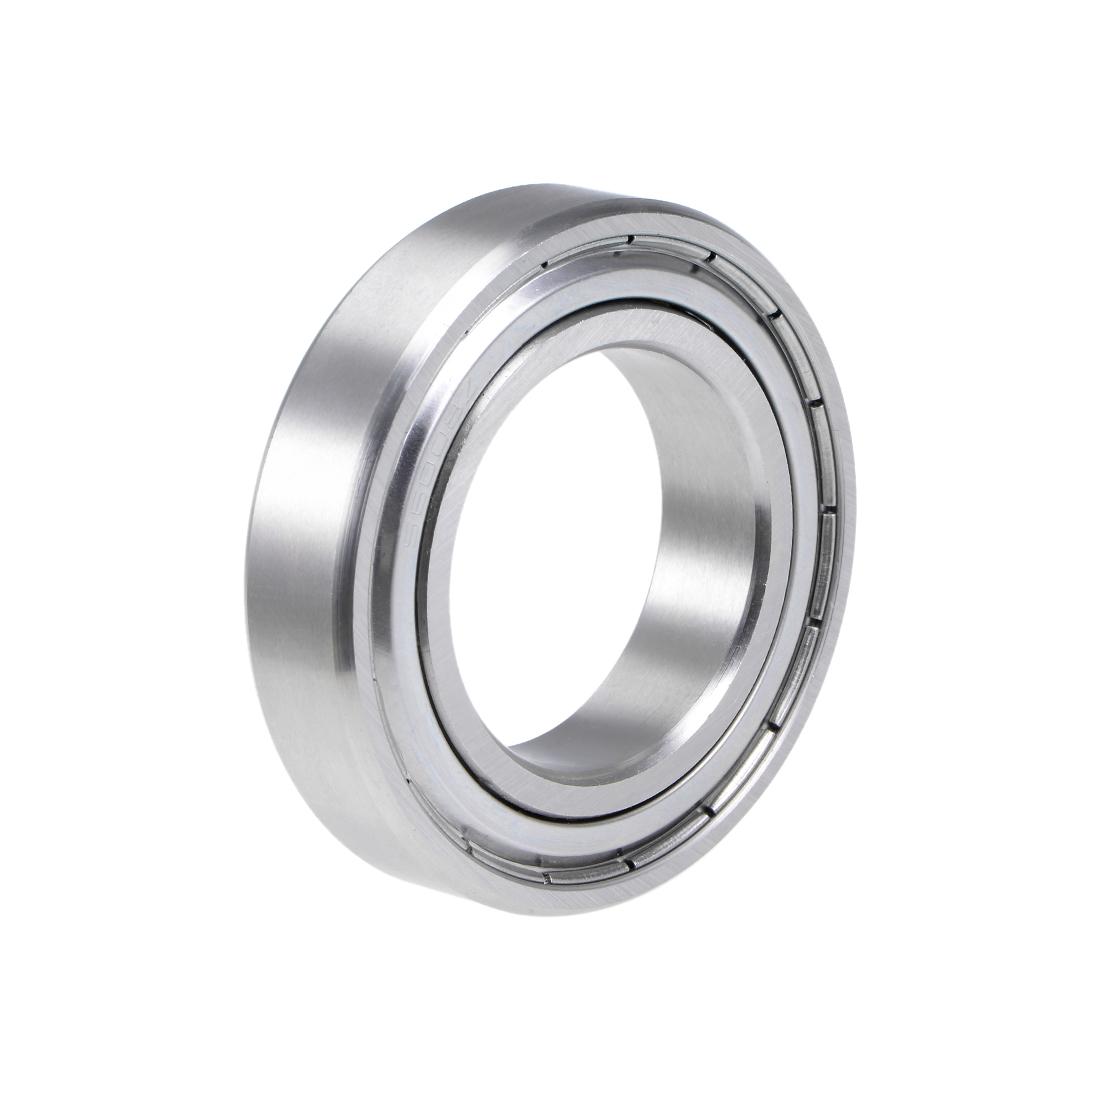 S6008ZZ Stainless Steel Ball Bearing 40x68x15mm Double Shielded 6008Z Bearings